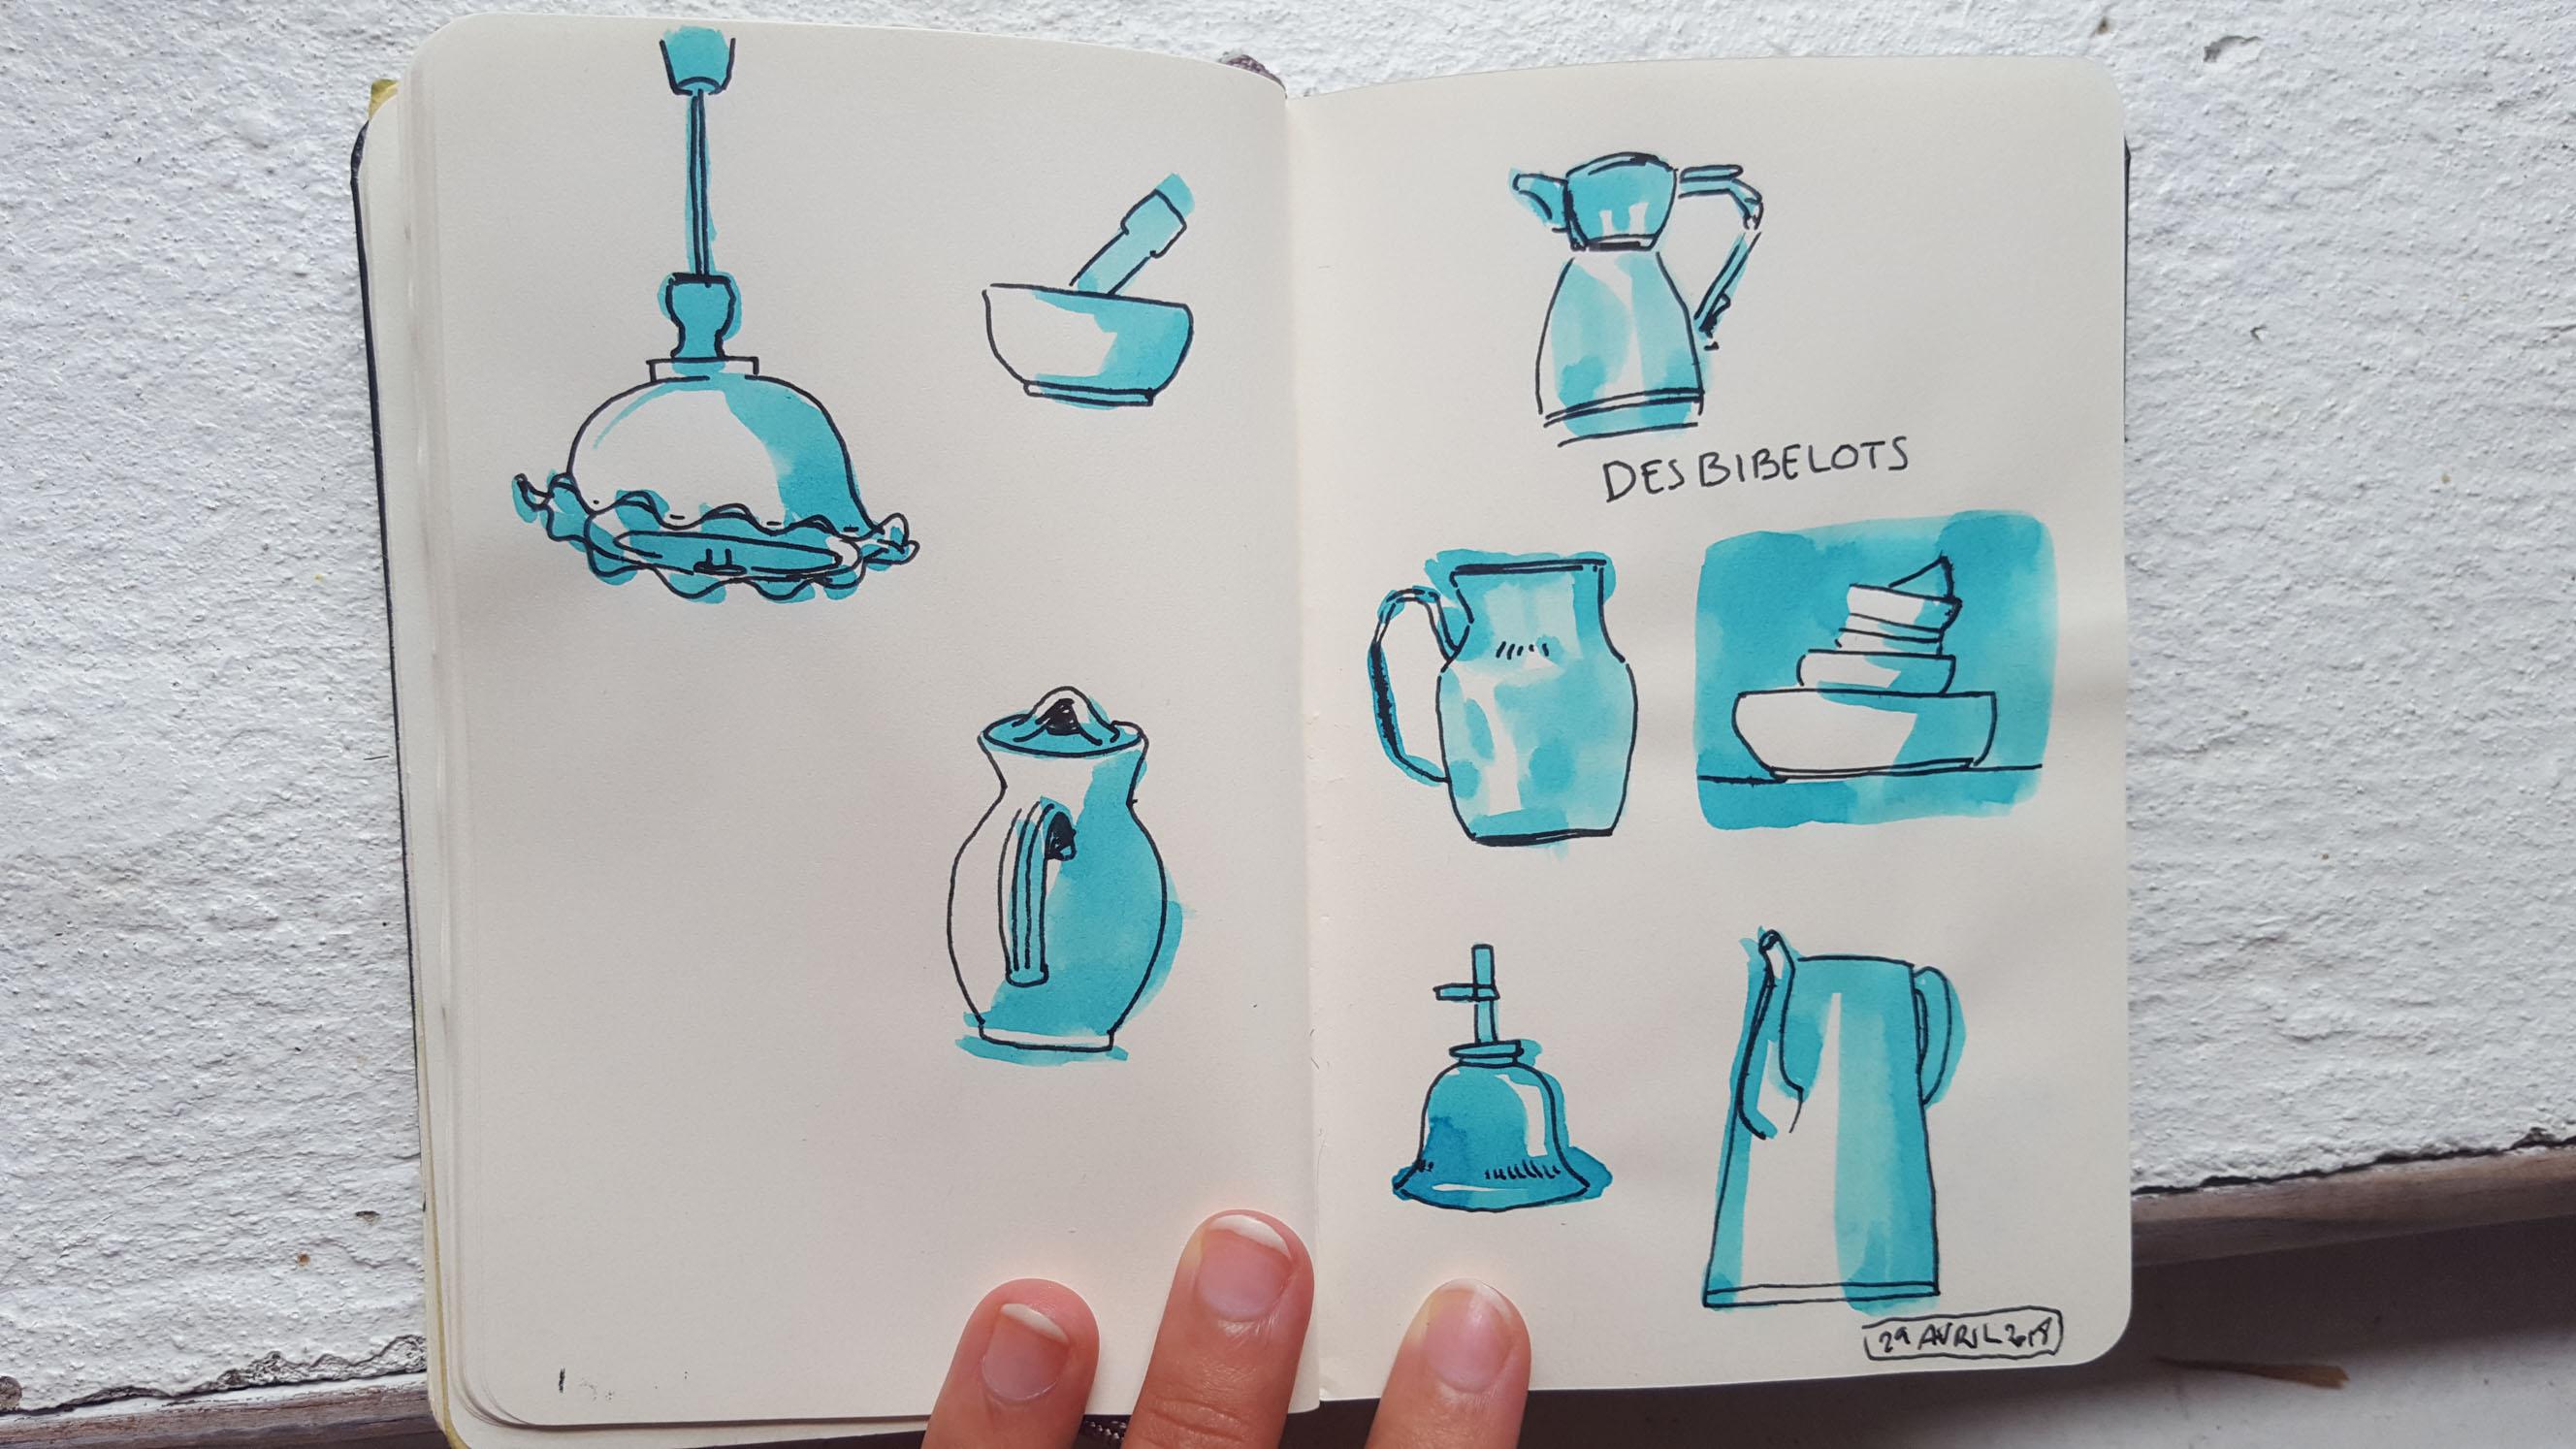 Sketchbook : IsaArne [ Challenge de l'ete P7 ] - Page 5 Facecr39